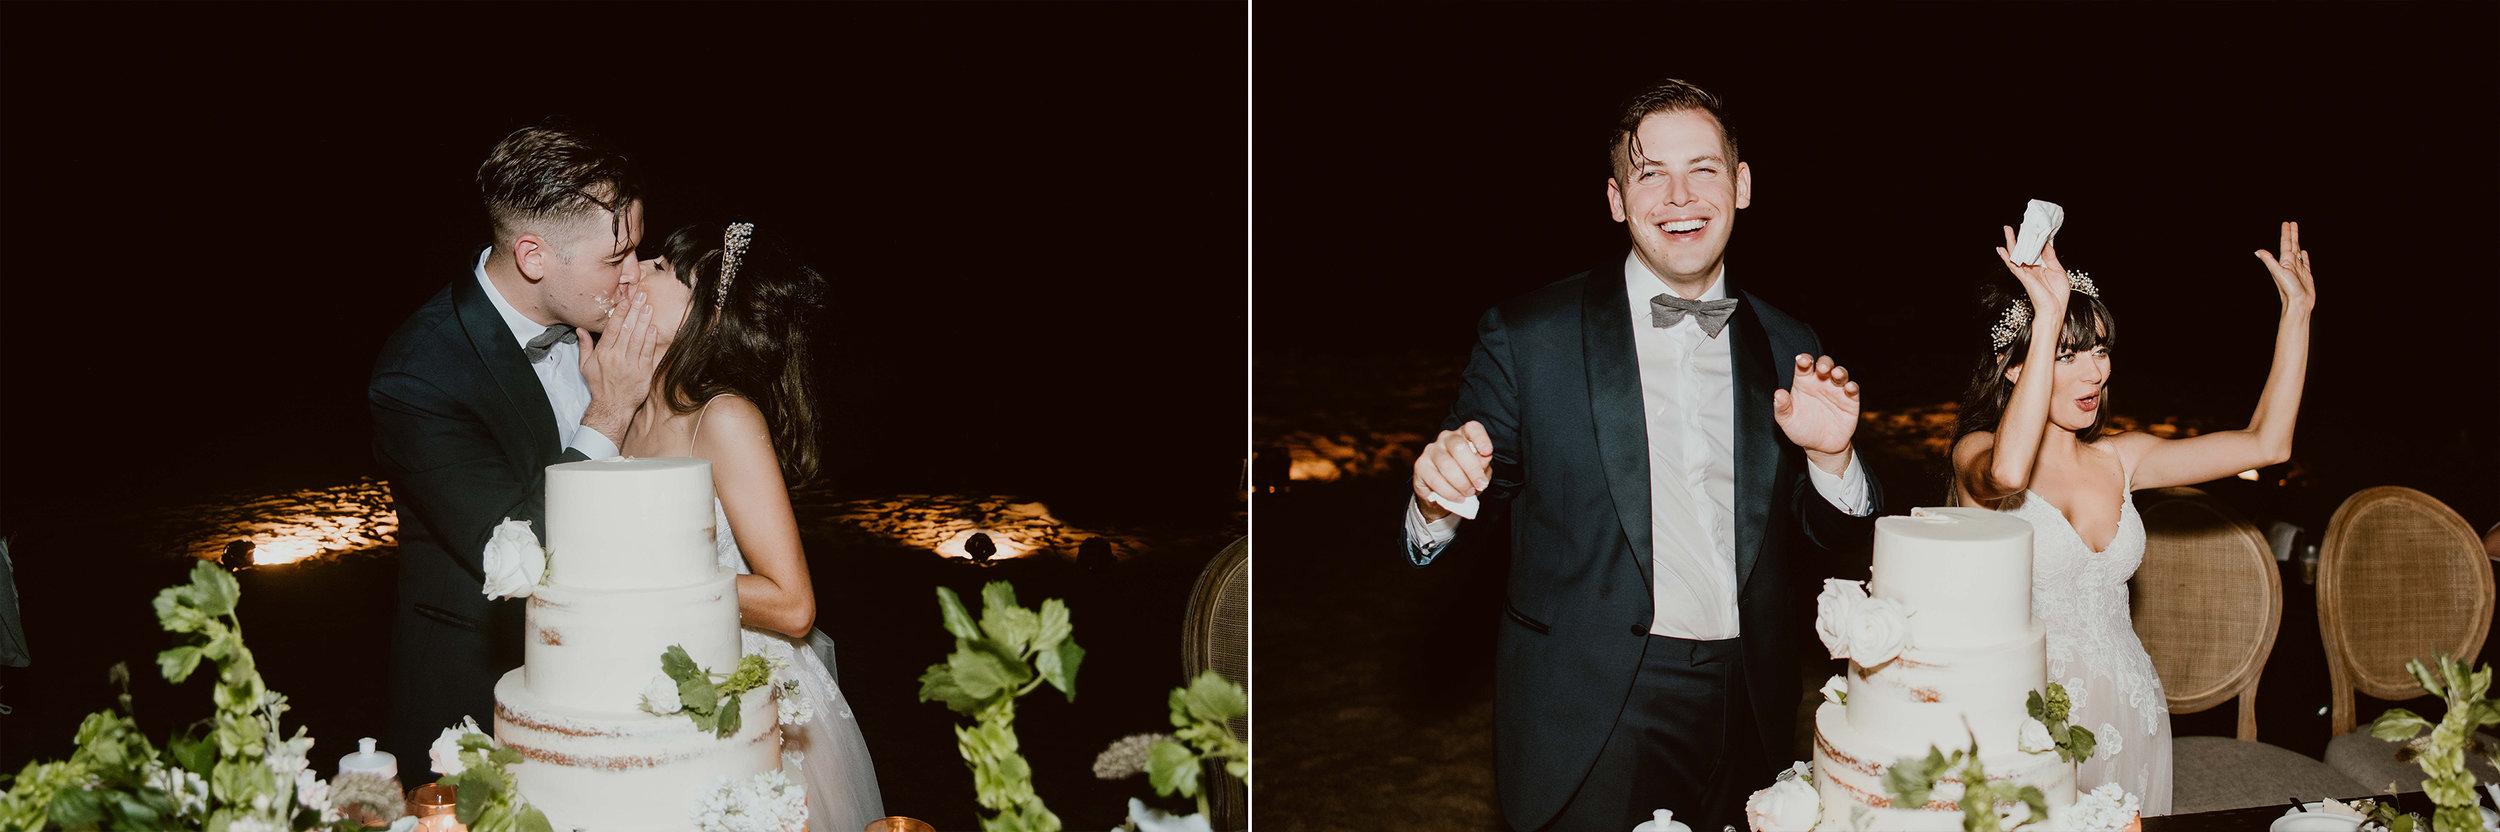 Mariana+Blake Sayulita Wedding-487-488.jpg